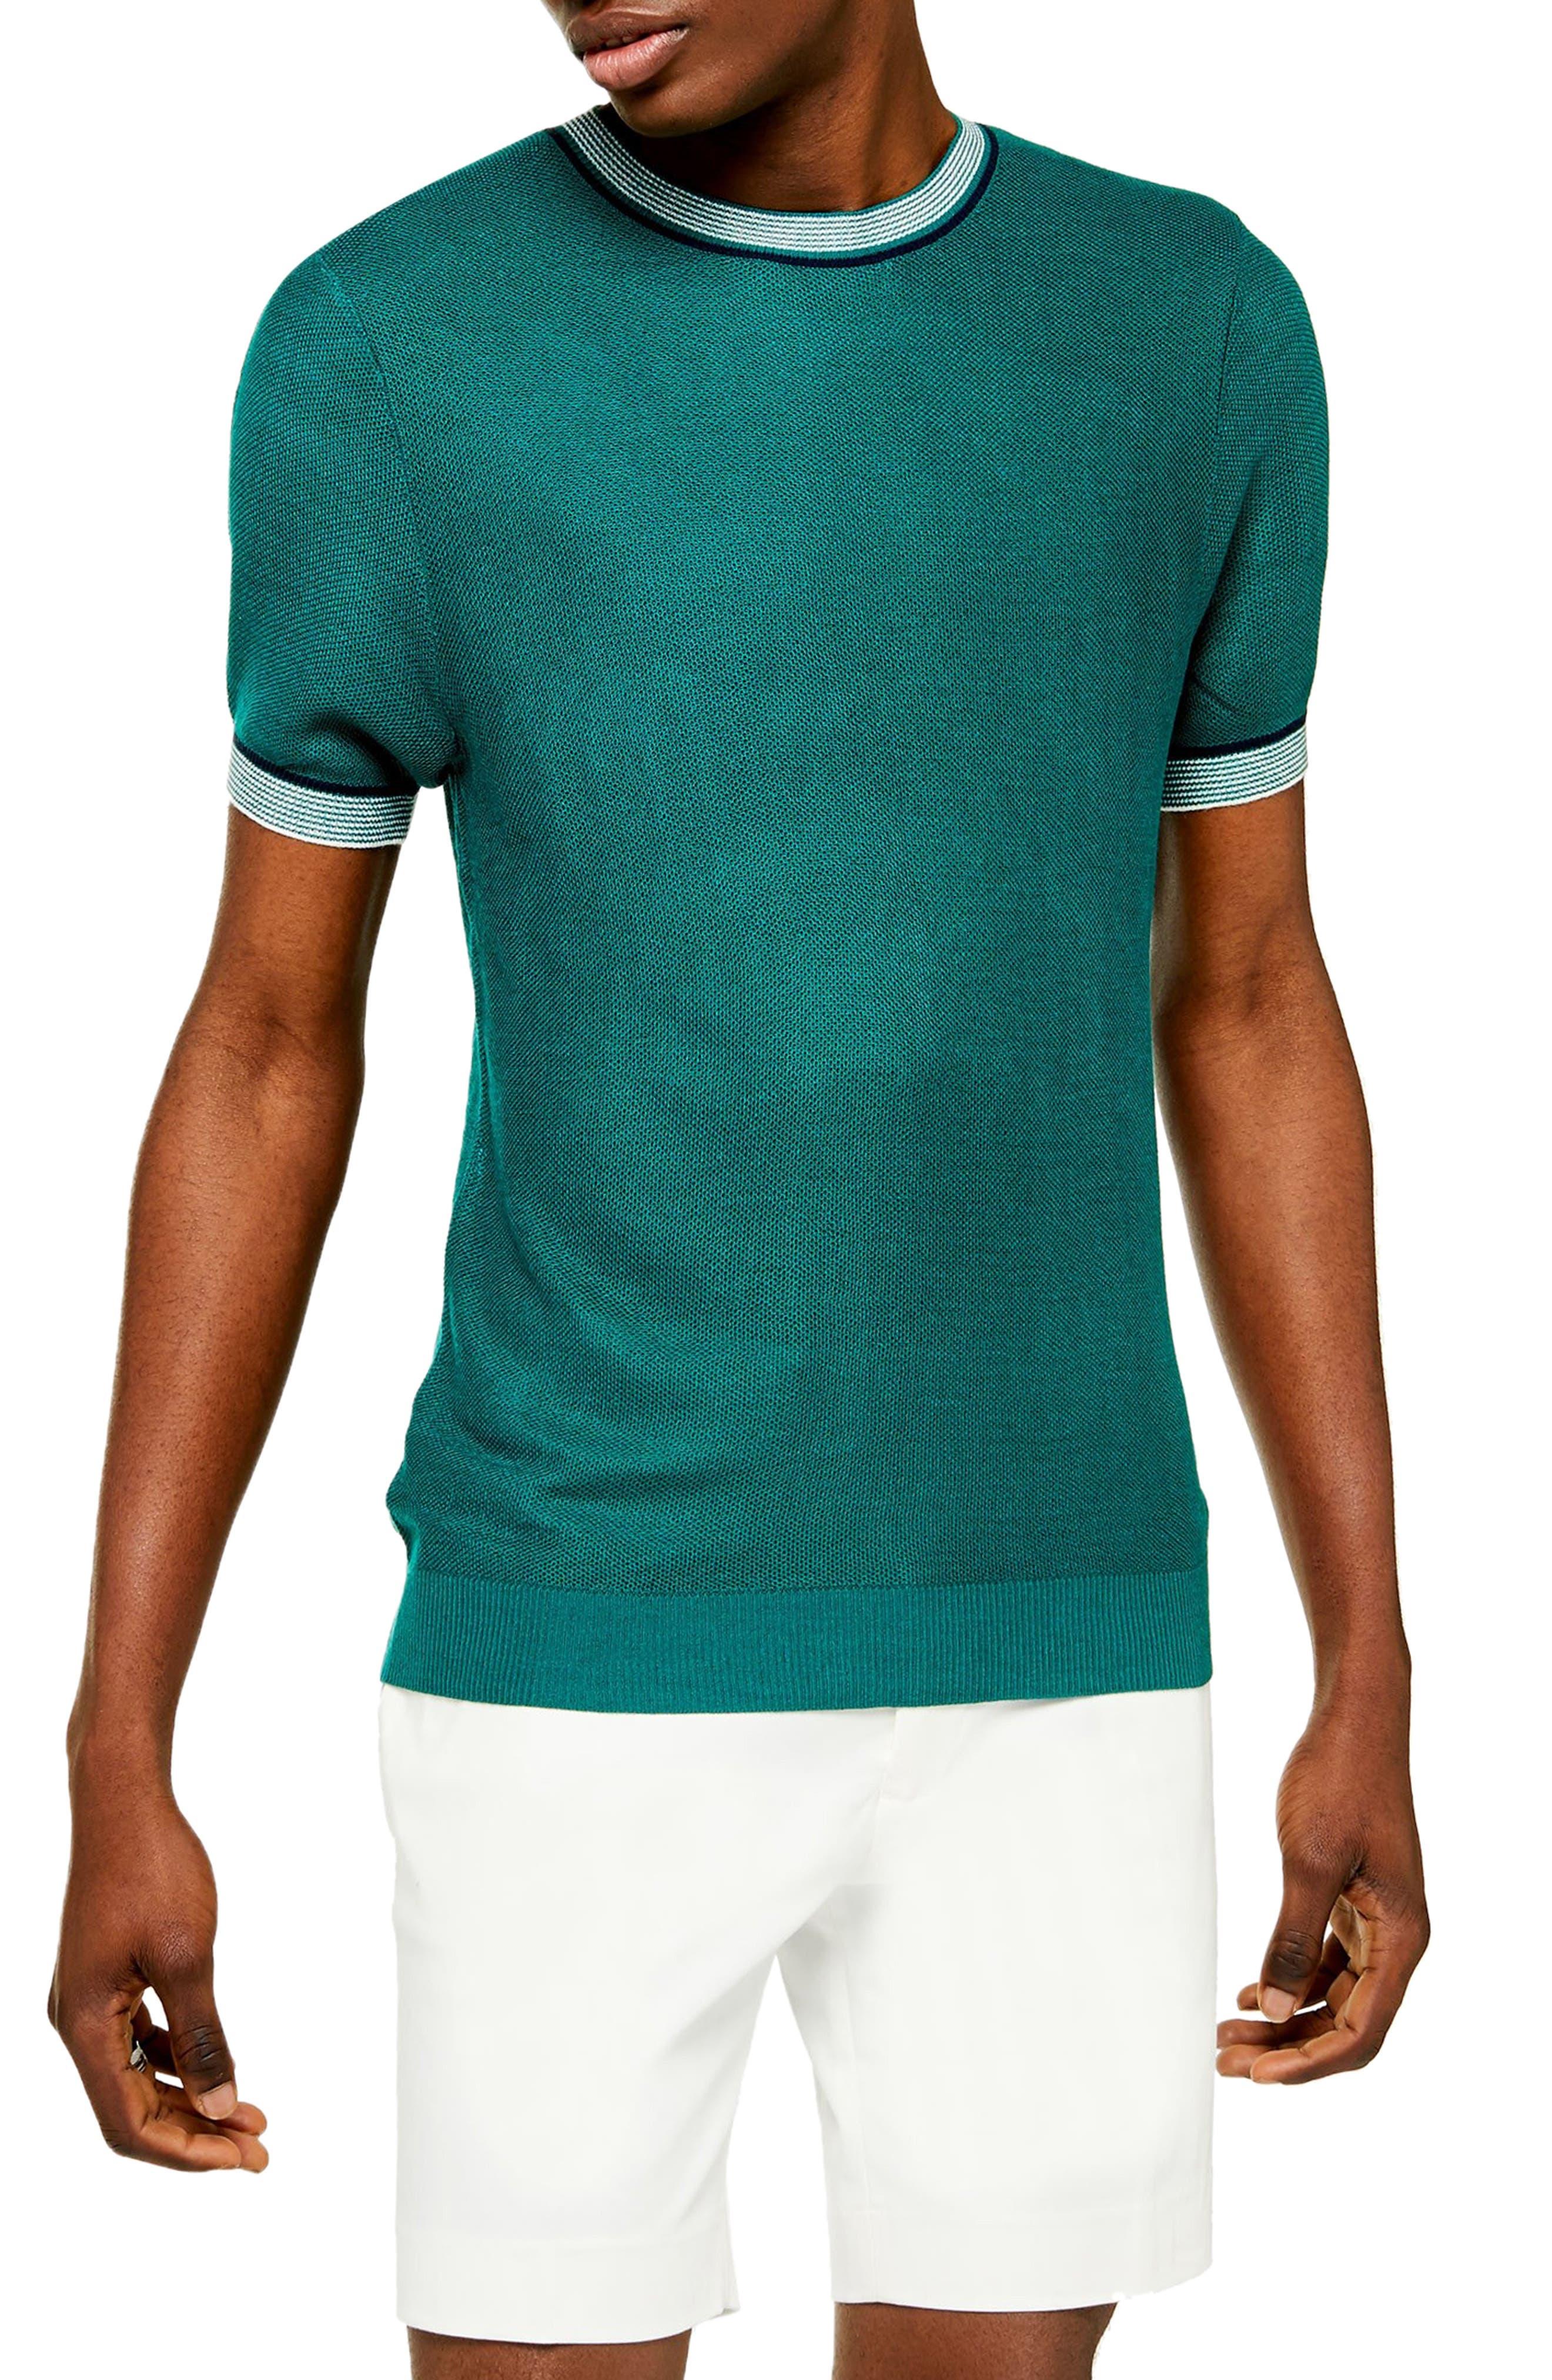 1950s Mens Shirts | Retro Bowling Shirts, Vintage Hawaiian Shirts Mens Topman Textured Tip Classic Fit Sweater $29.98 AT vintagedancer.com